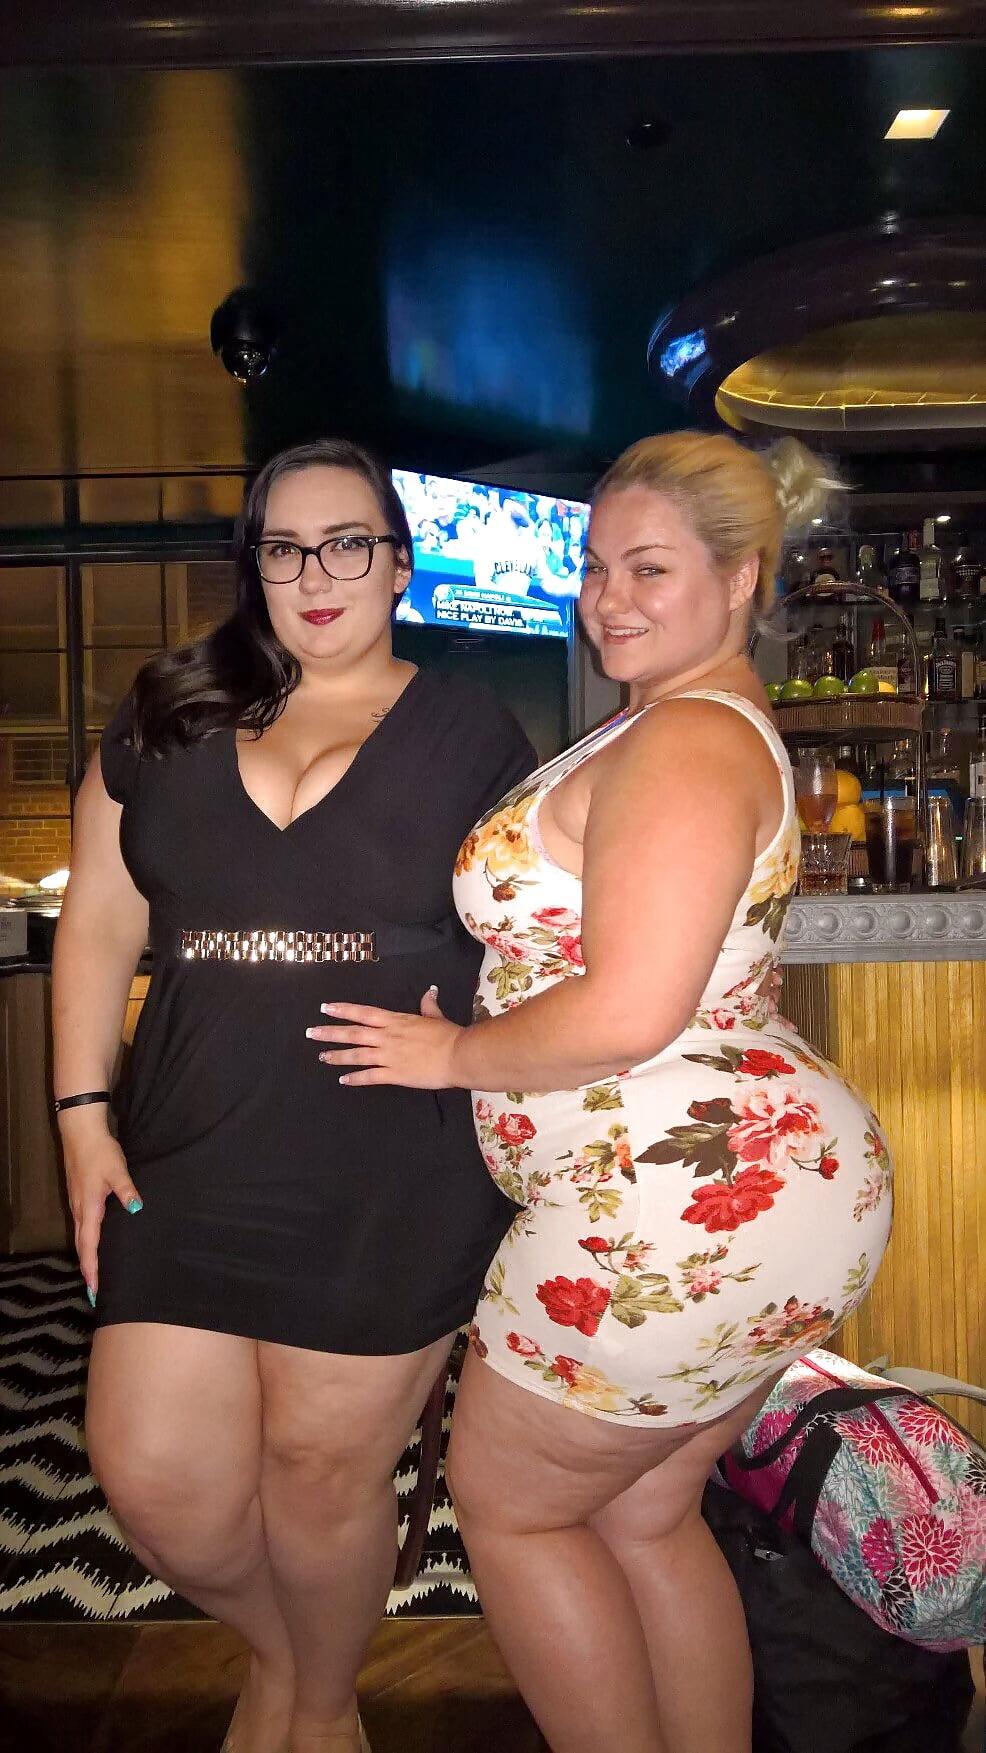 Divalicous showgirls